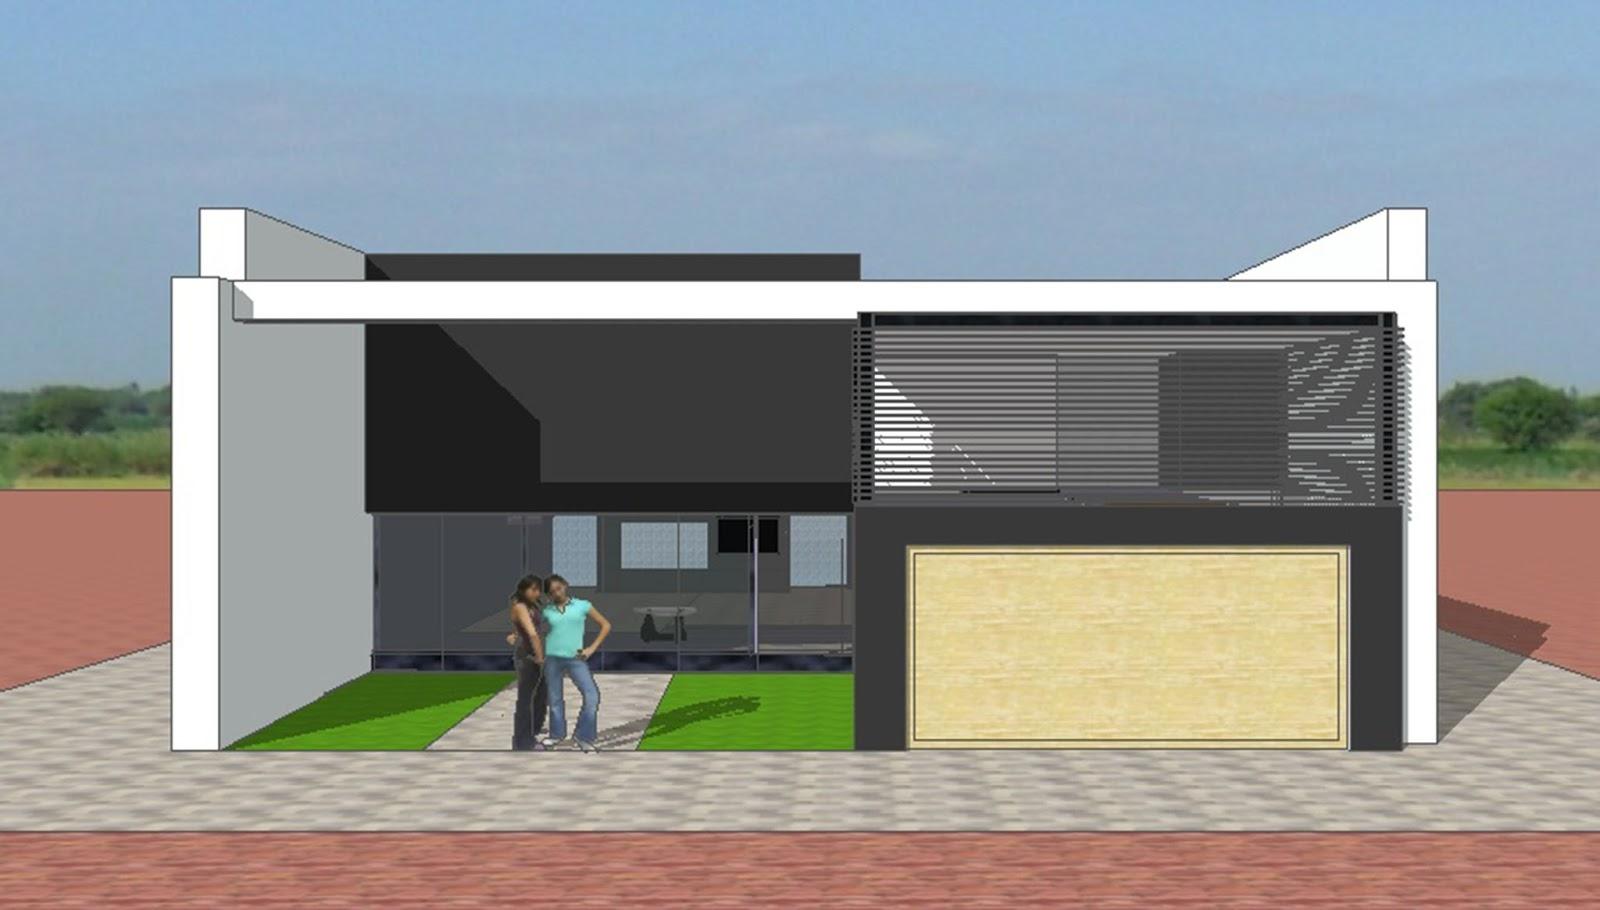 Fachadas y casas magn ficas fachadas para casas sencillas for Diseno de casa sencilla